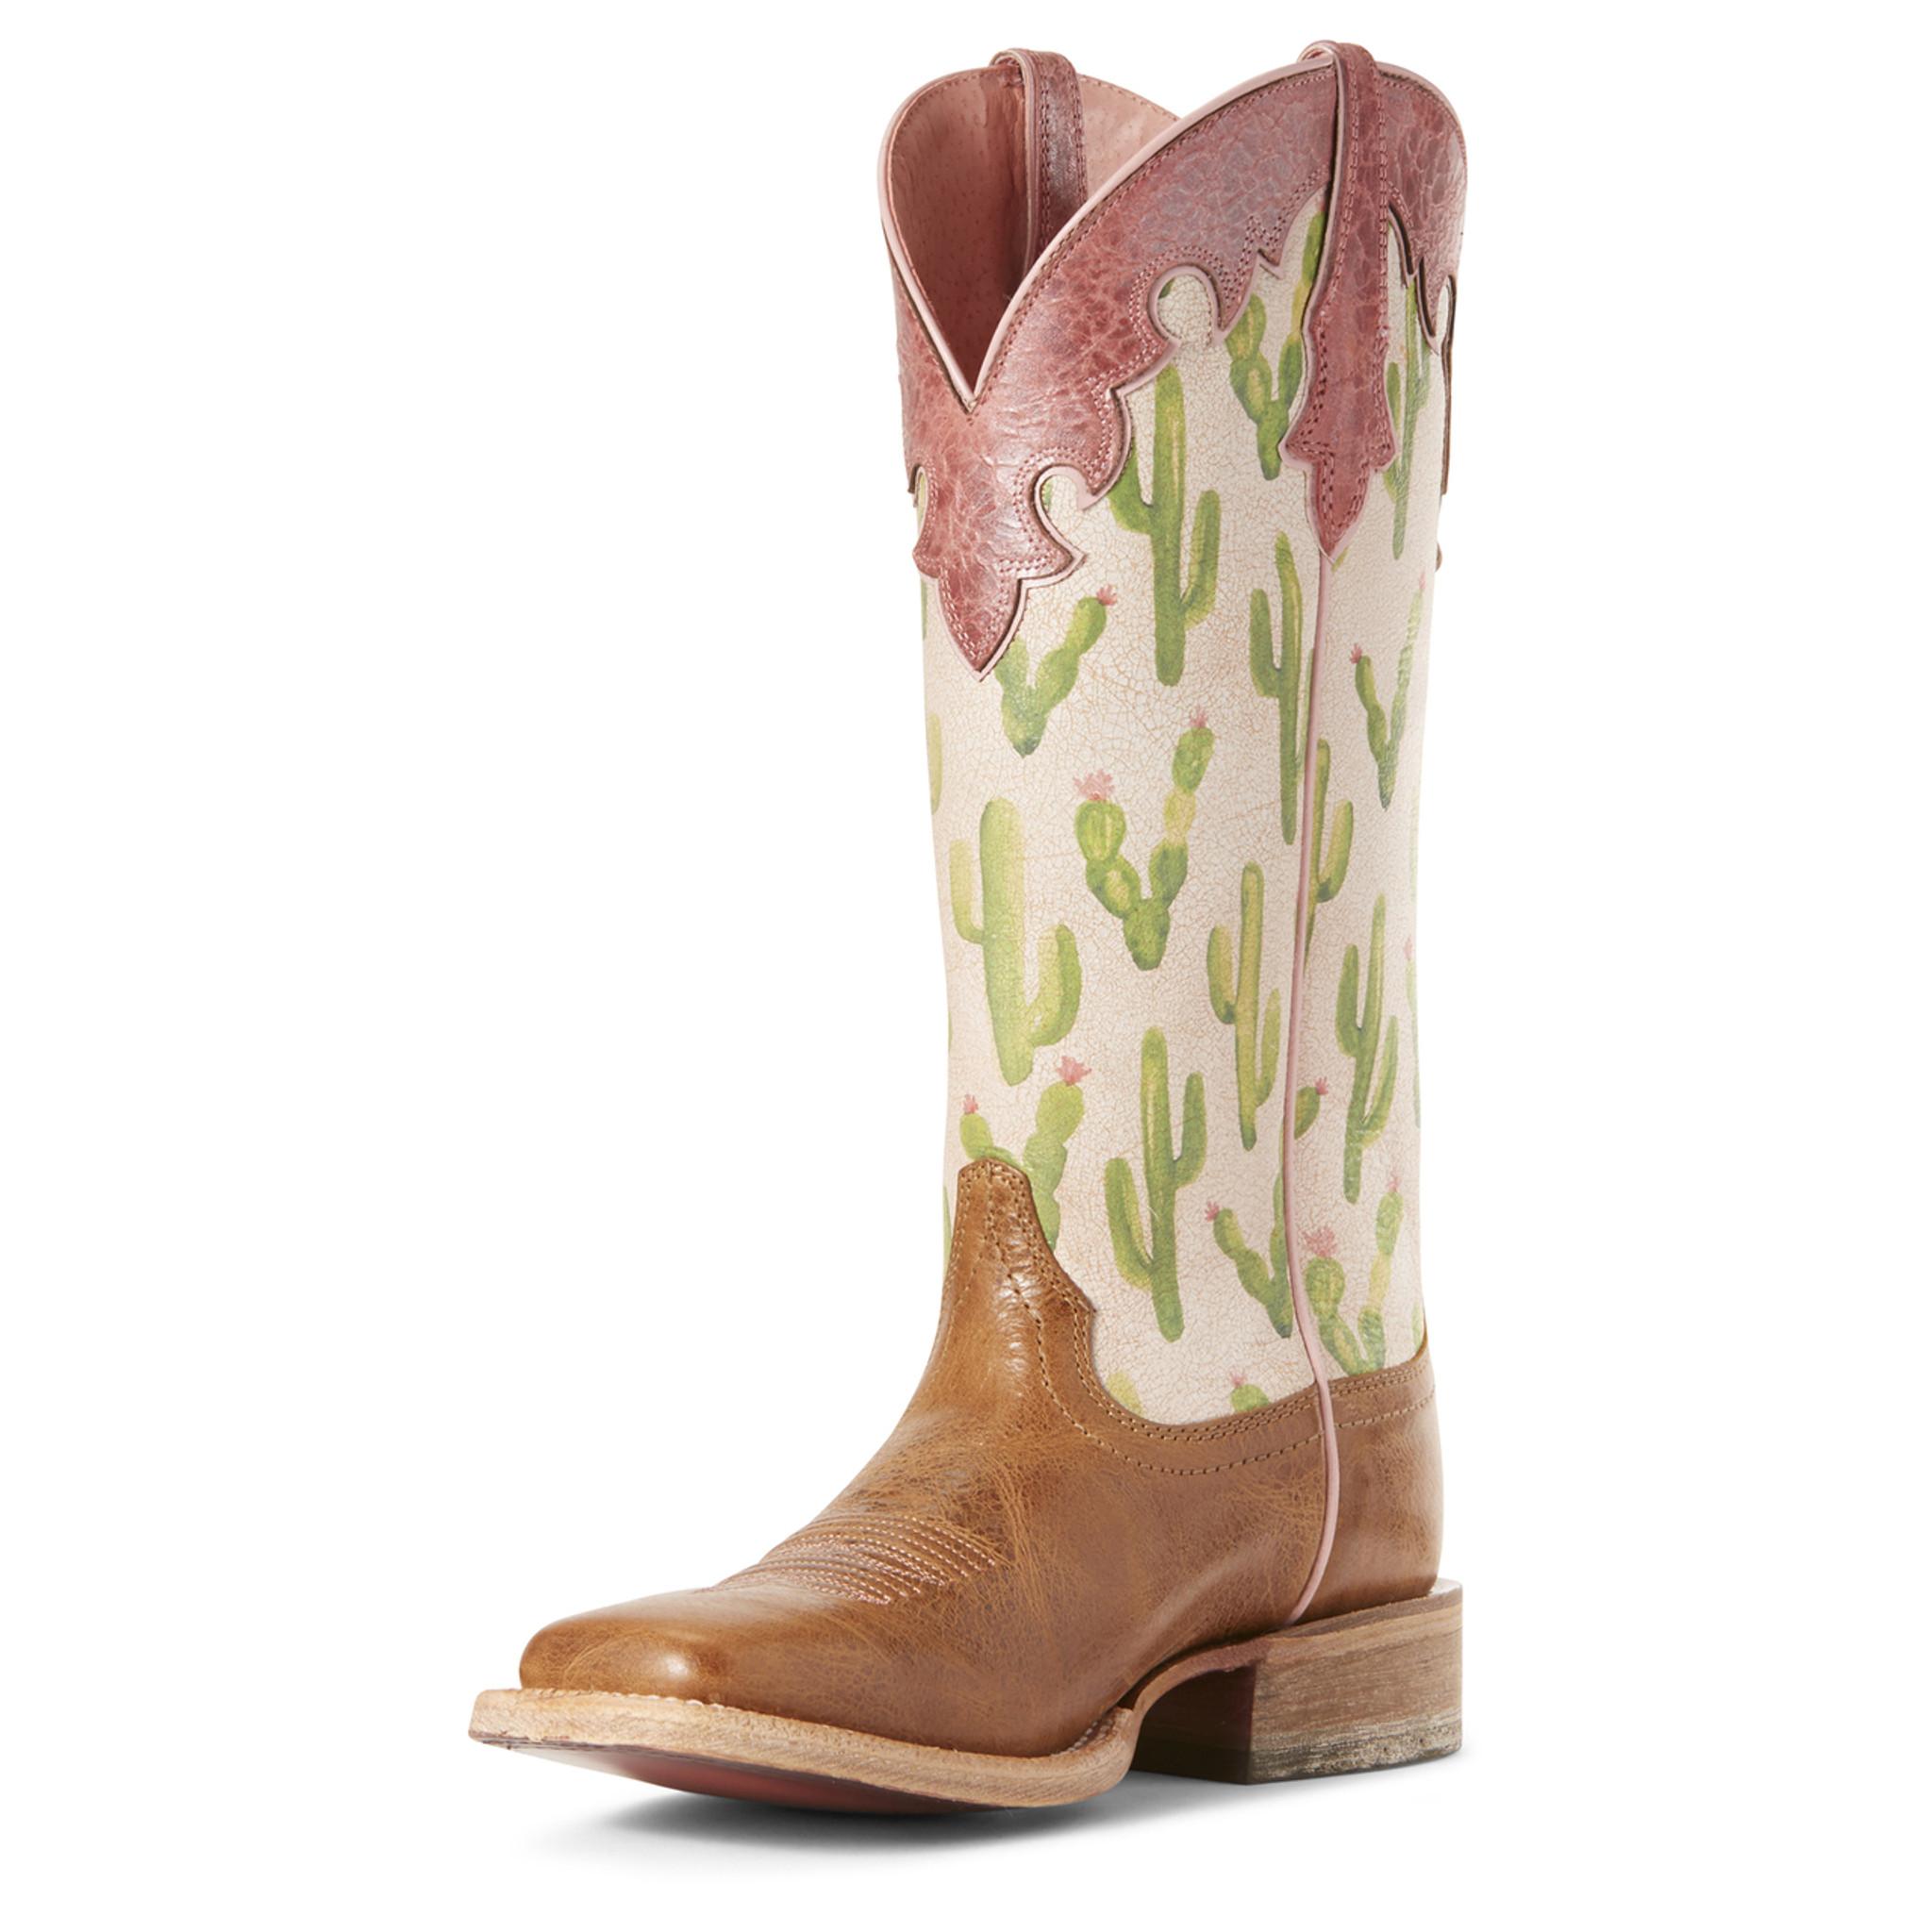 Women's Ariat Boot, Fonda, Tan Vamp